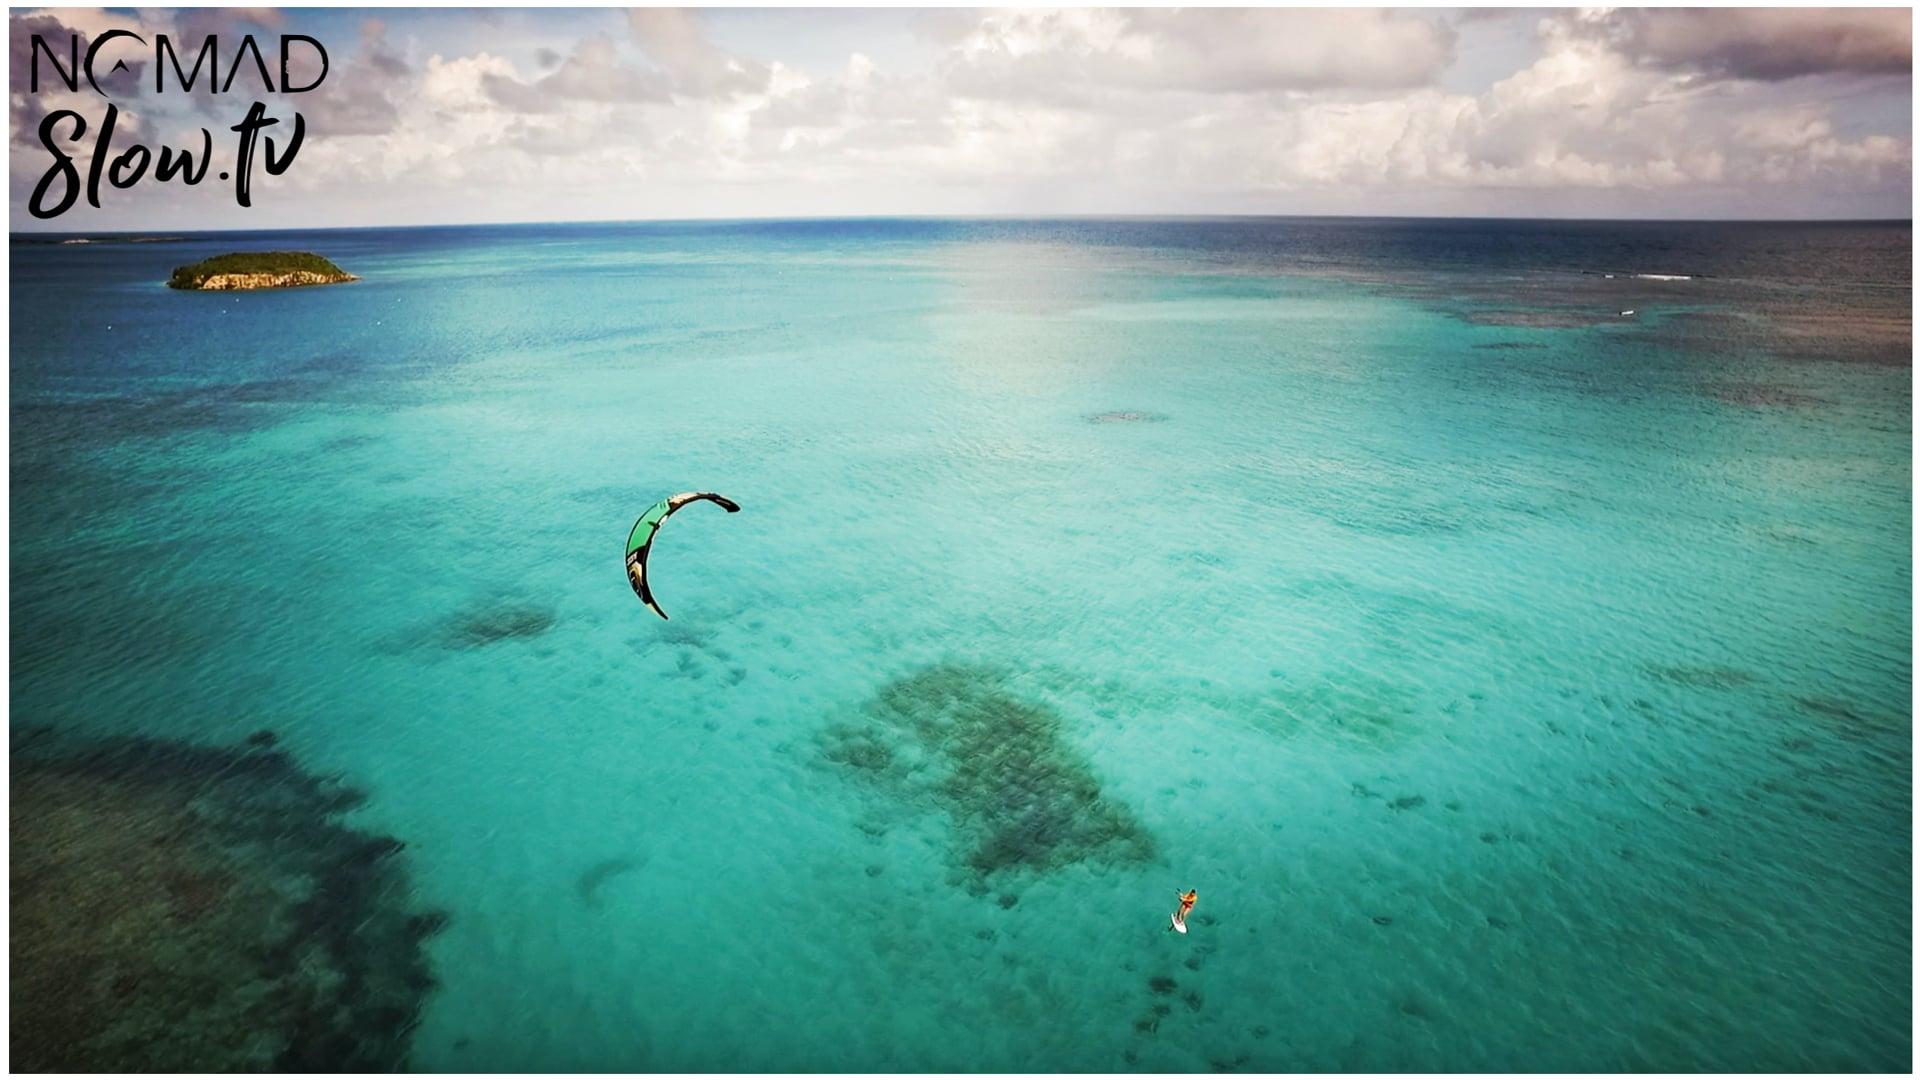 Kitesurf drone by Antoine Leger  Organ Mood - Corridor Appalachien & Entremise